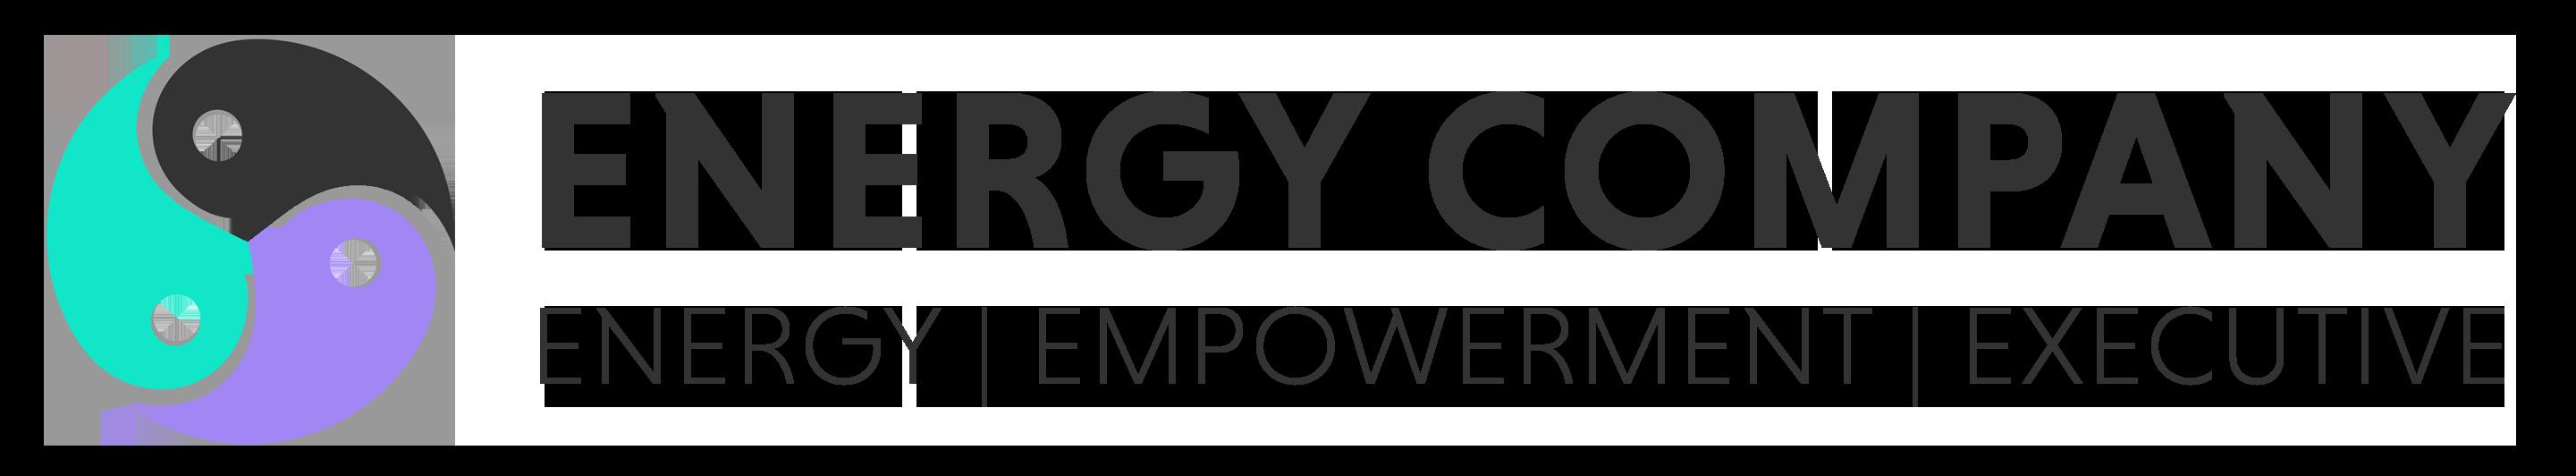 Energy Company 360